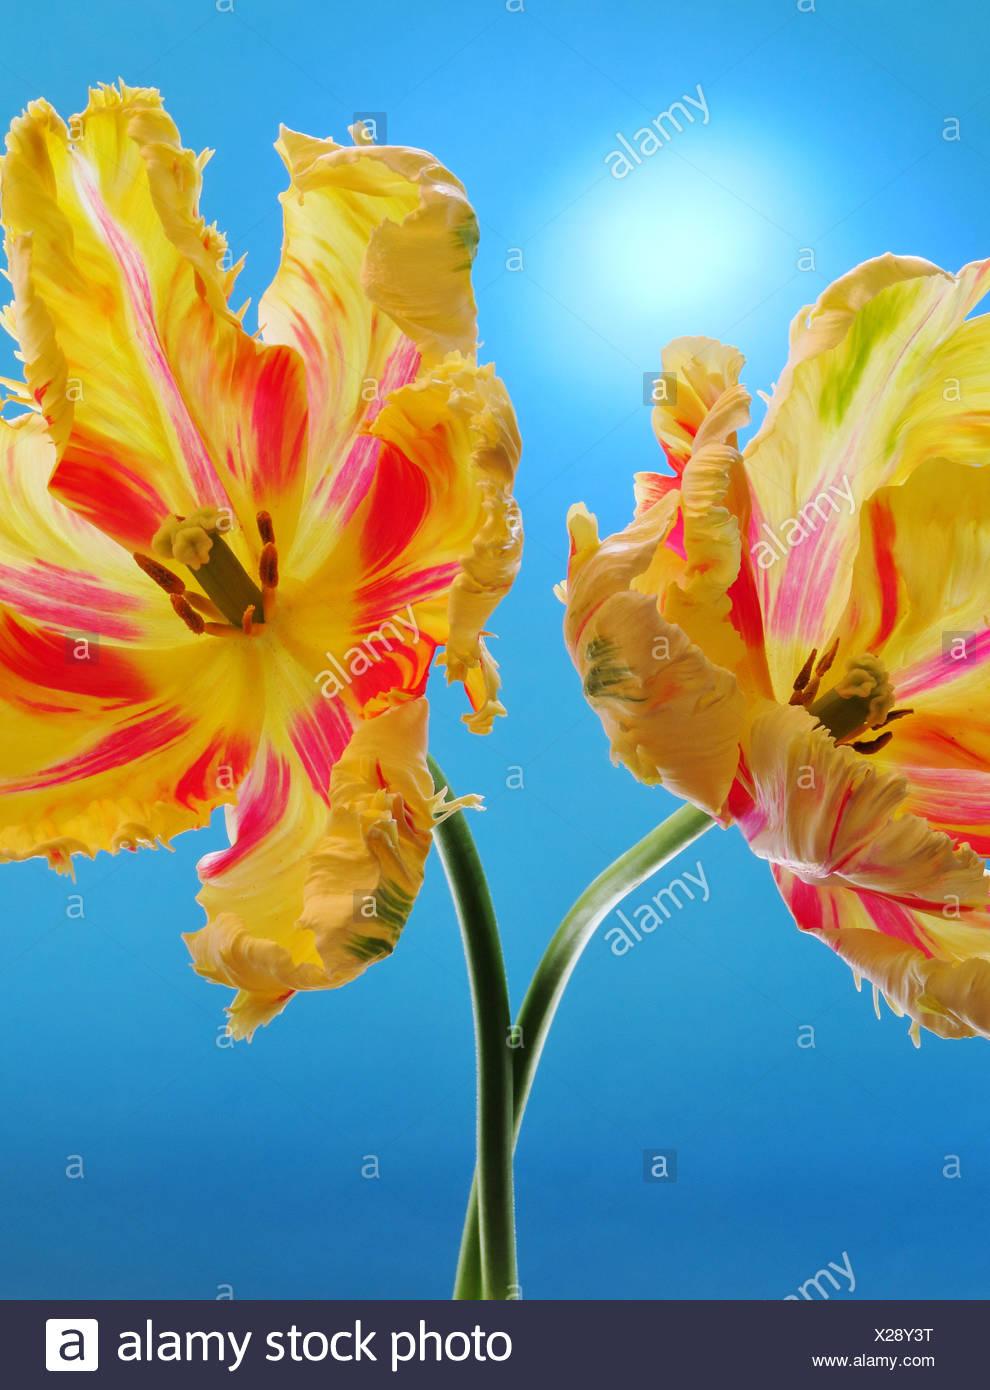 Blumen, Pflanzen, Tulpen, zwei, Blüten, blüht, Tasse, rot, gelb, Konzepte, Stockbild